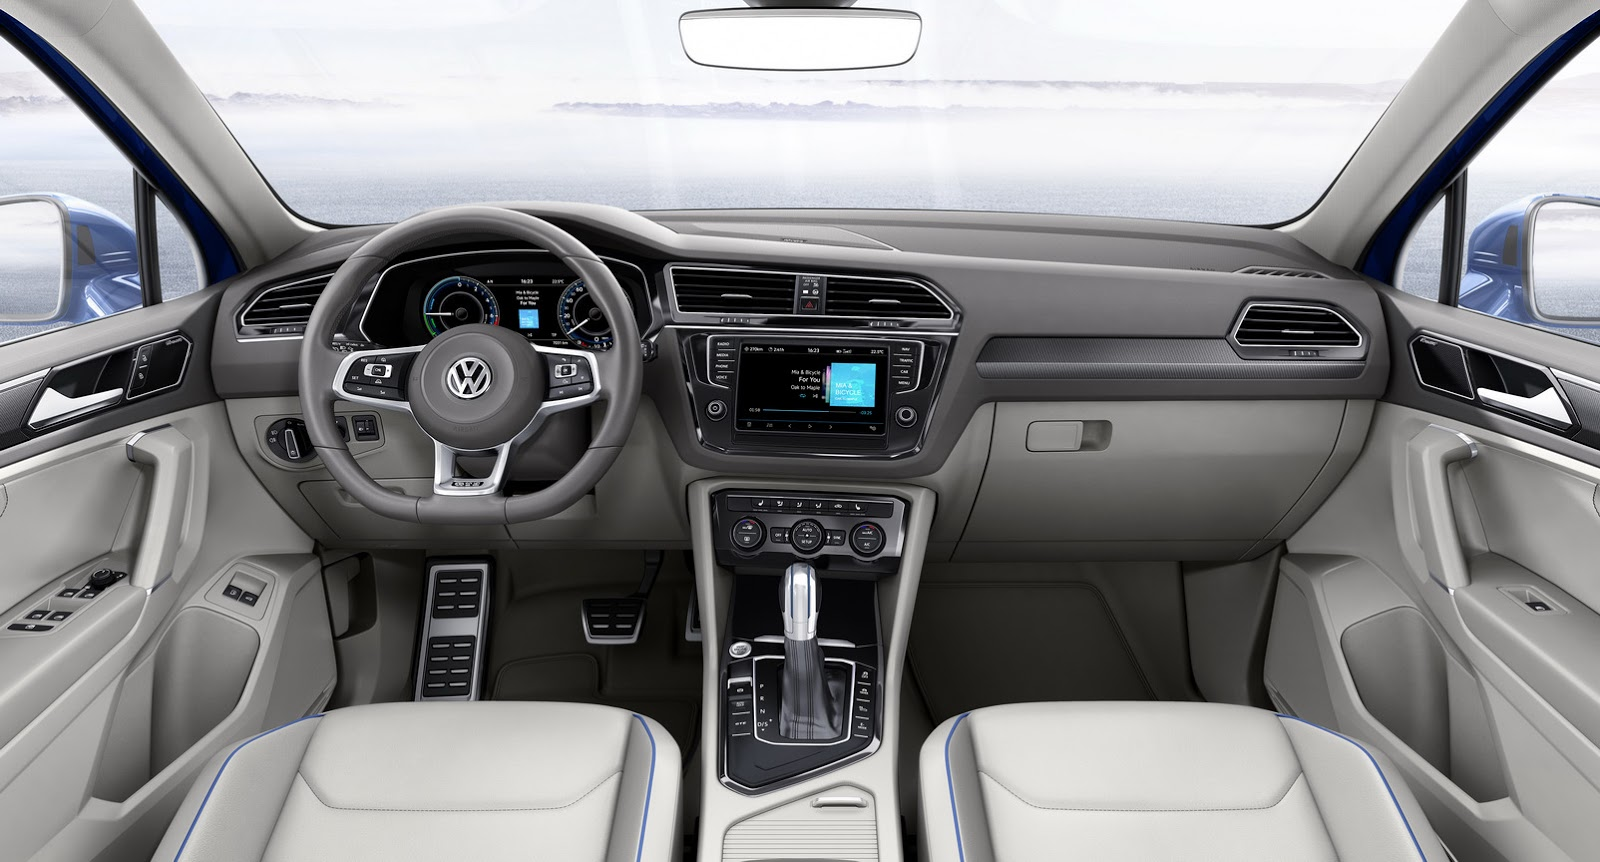 Spyshots: 2019 Volkswagen Tiguan GTE Has Tiguan L 430 PHEV Badging - autoevolution